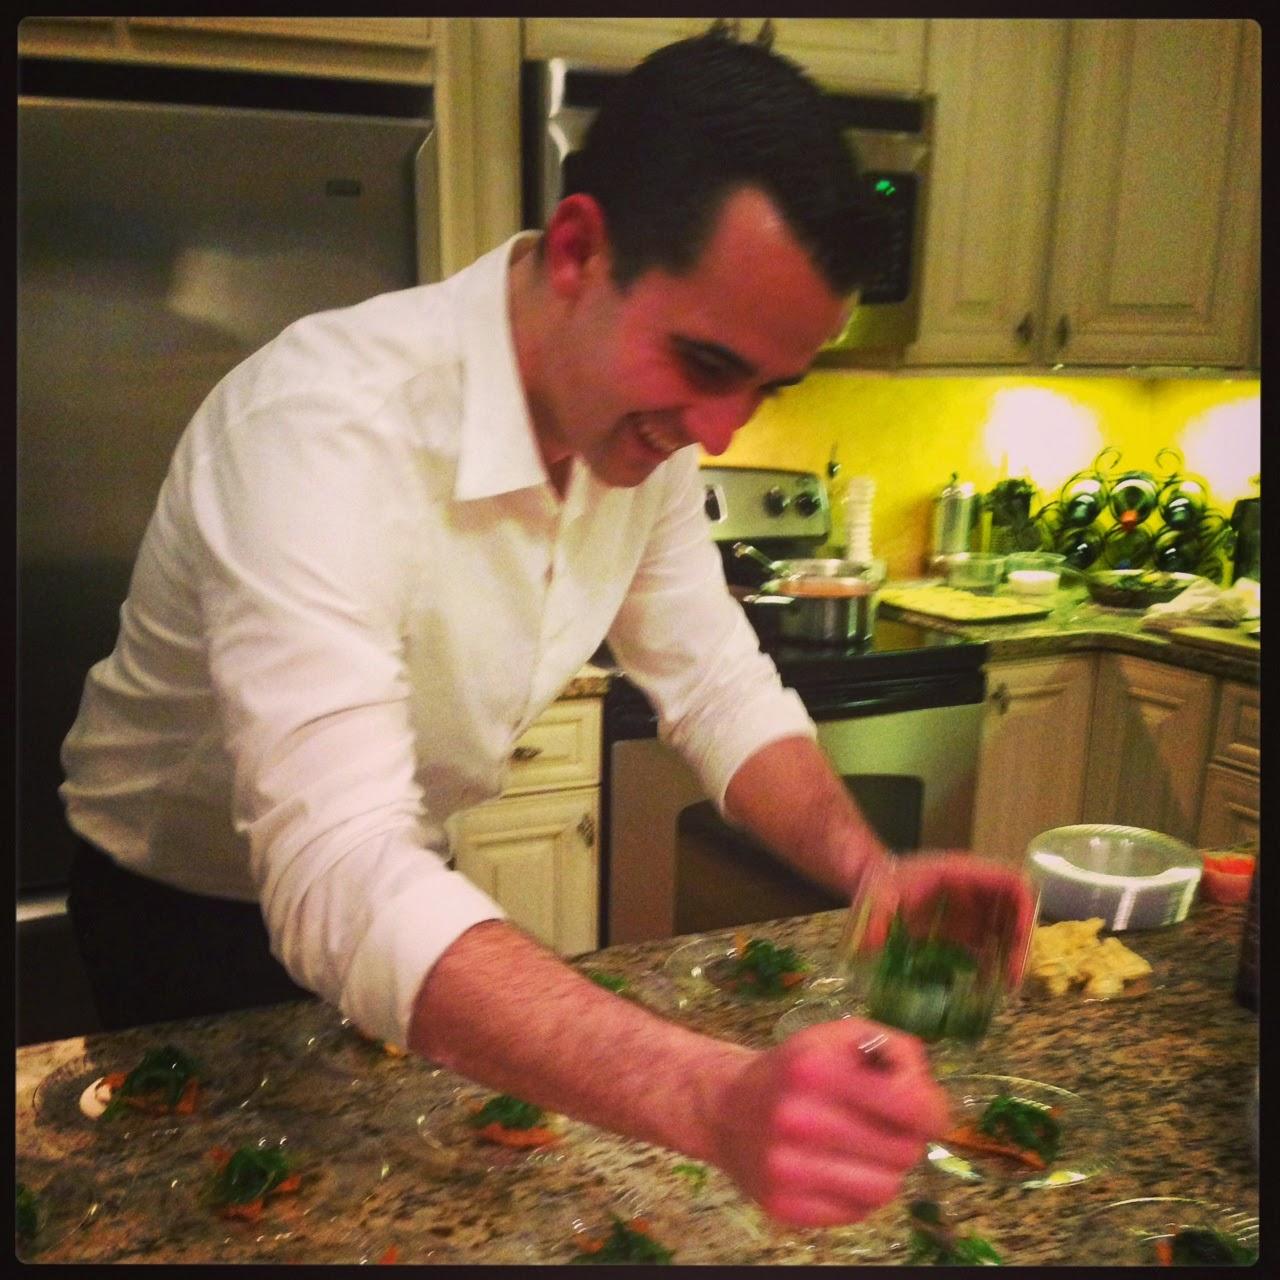 Not actually Stephen Coe, his Sous Chef